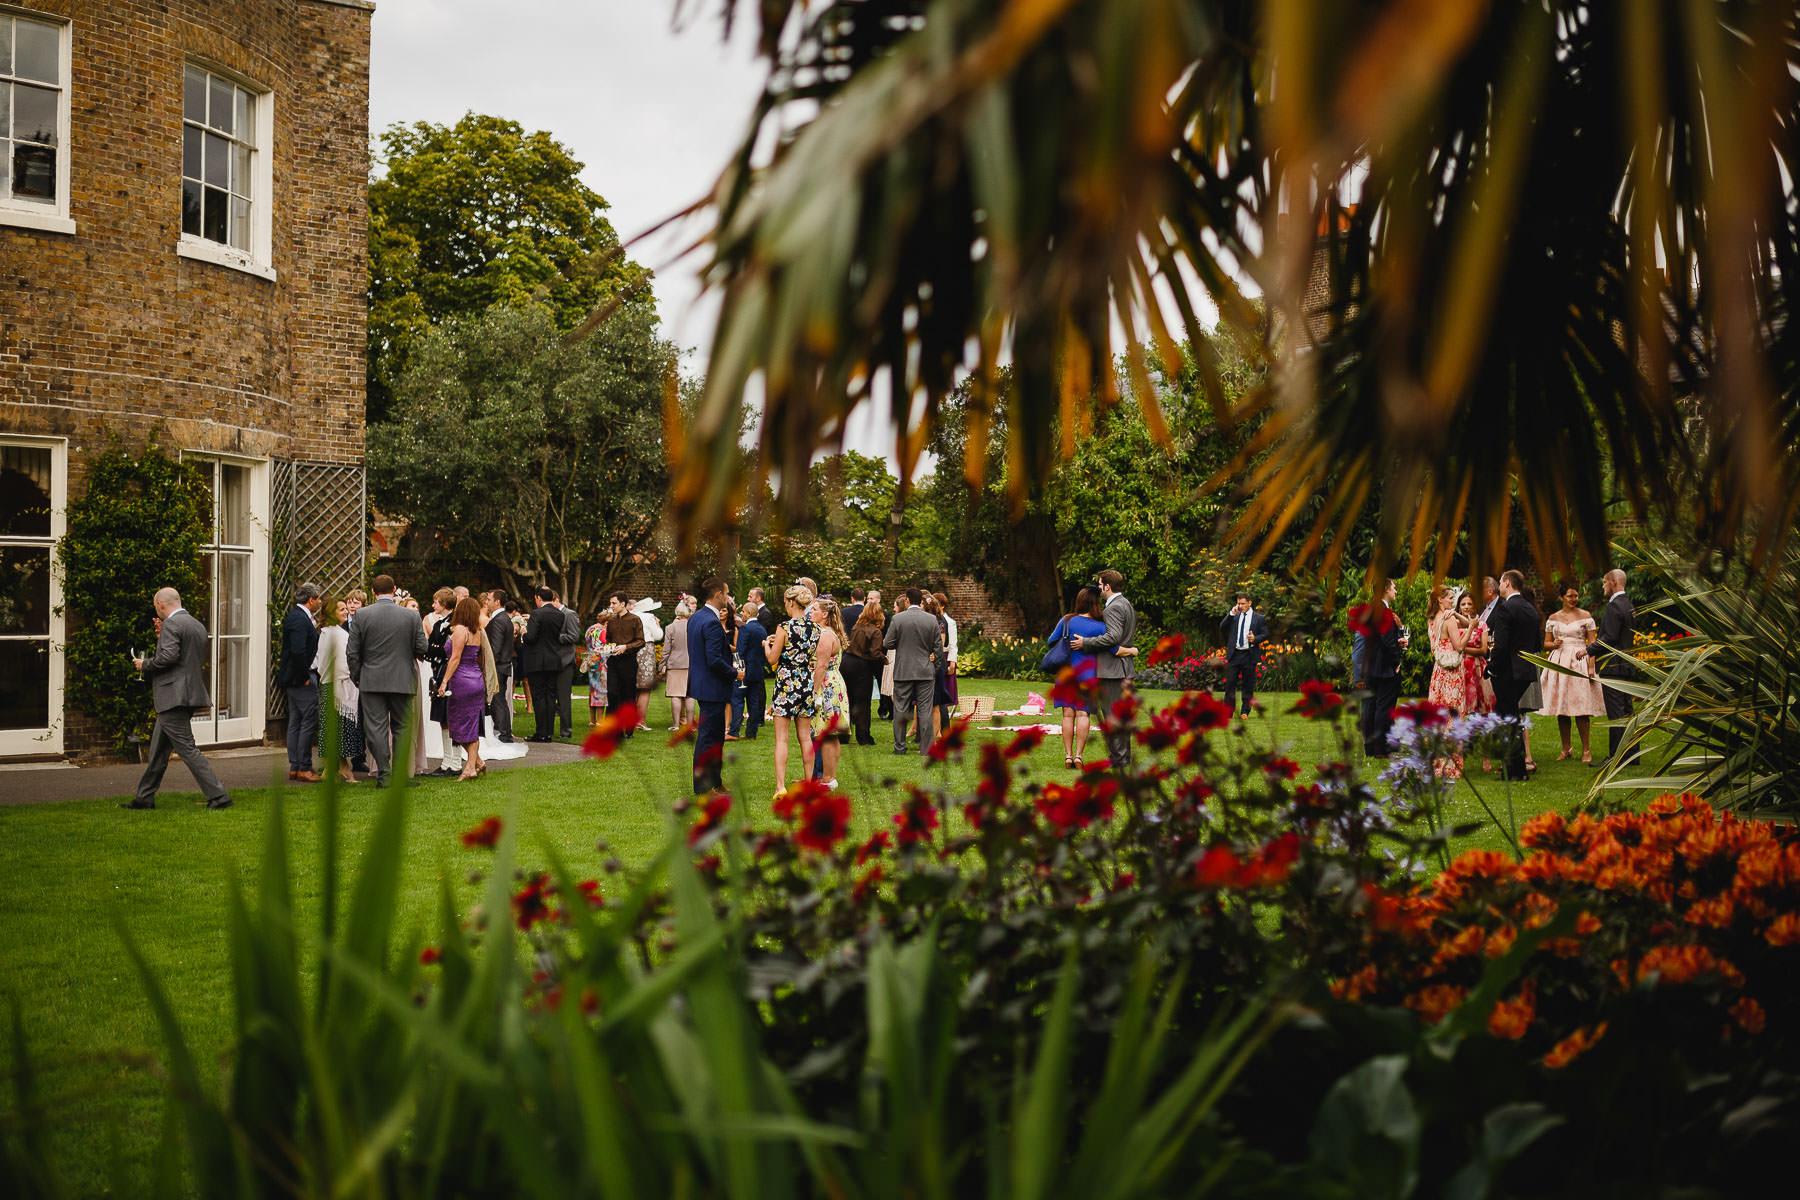 kew gardens wedding photography astra duncan35